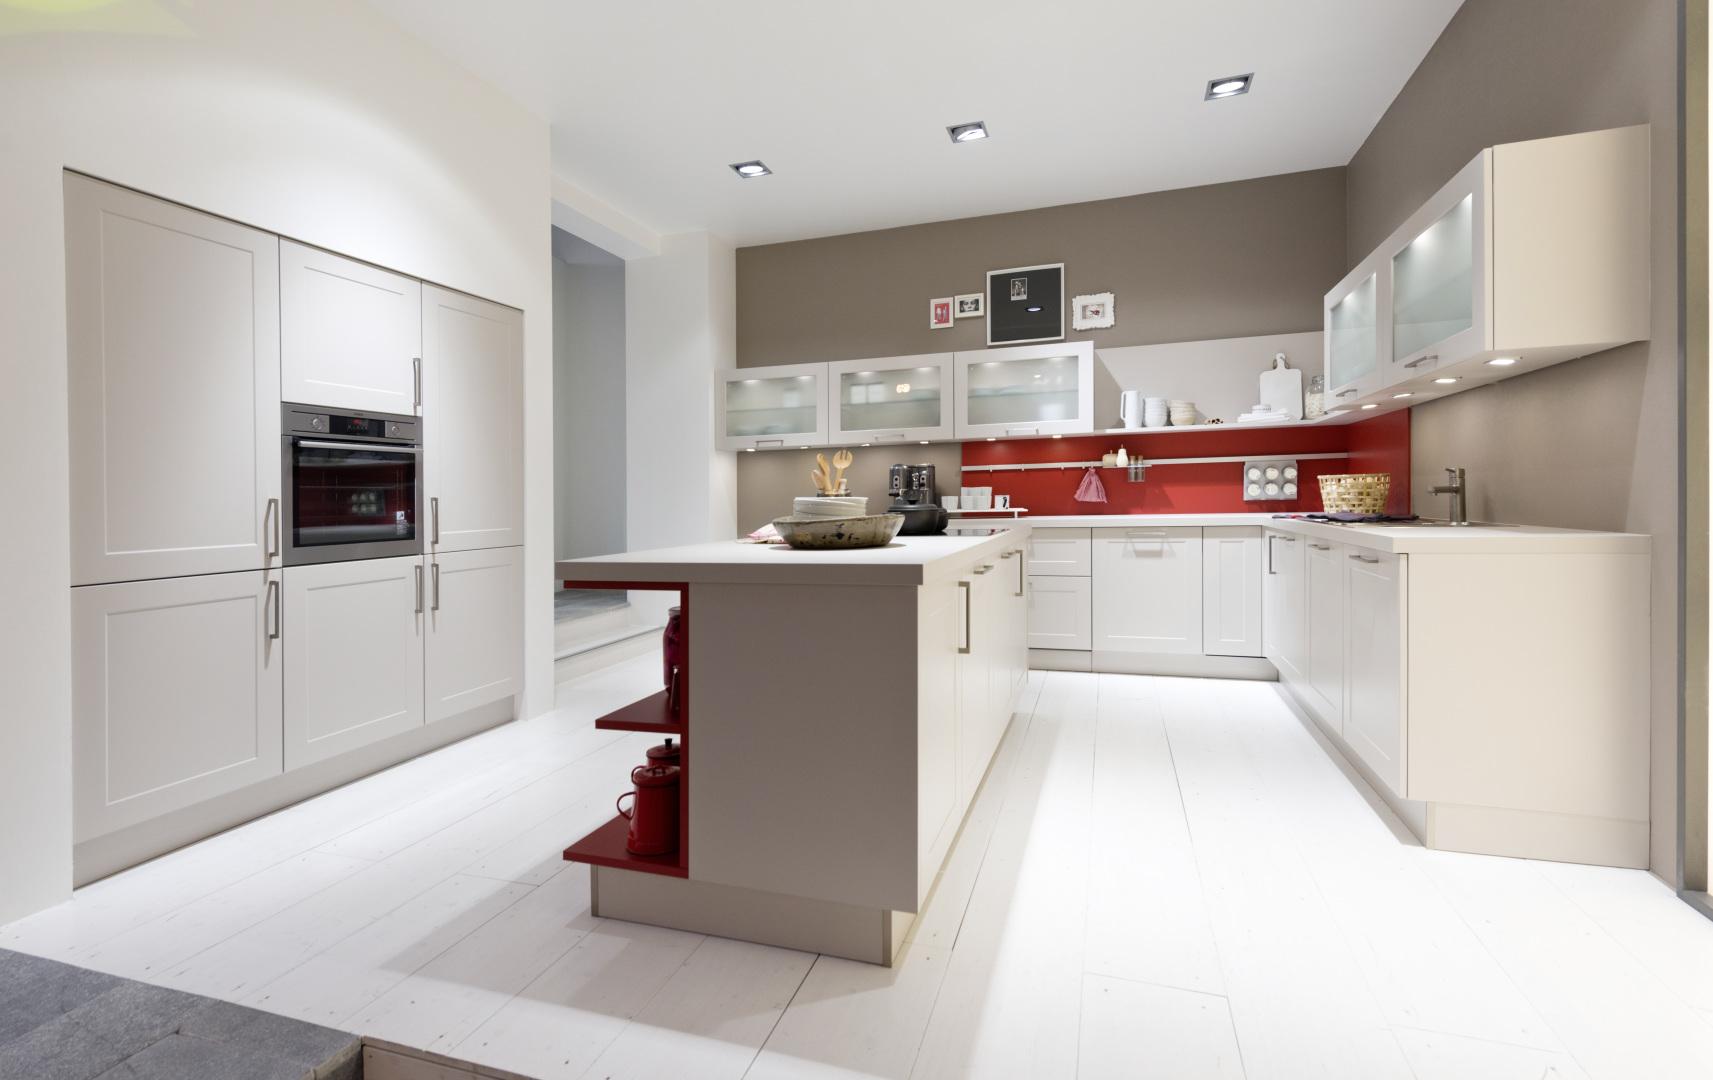 moderne landhausk che online planen kaufen. Black Bedroom Furniture Sets. Home Design Ideas